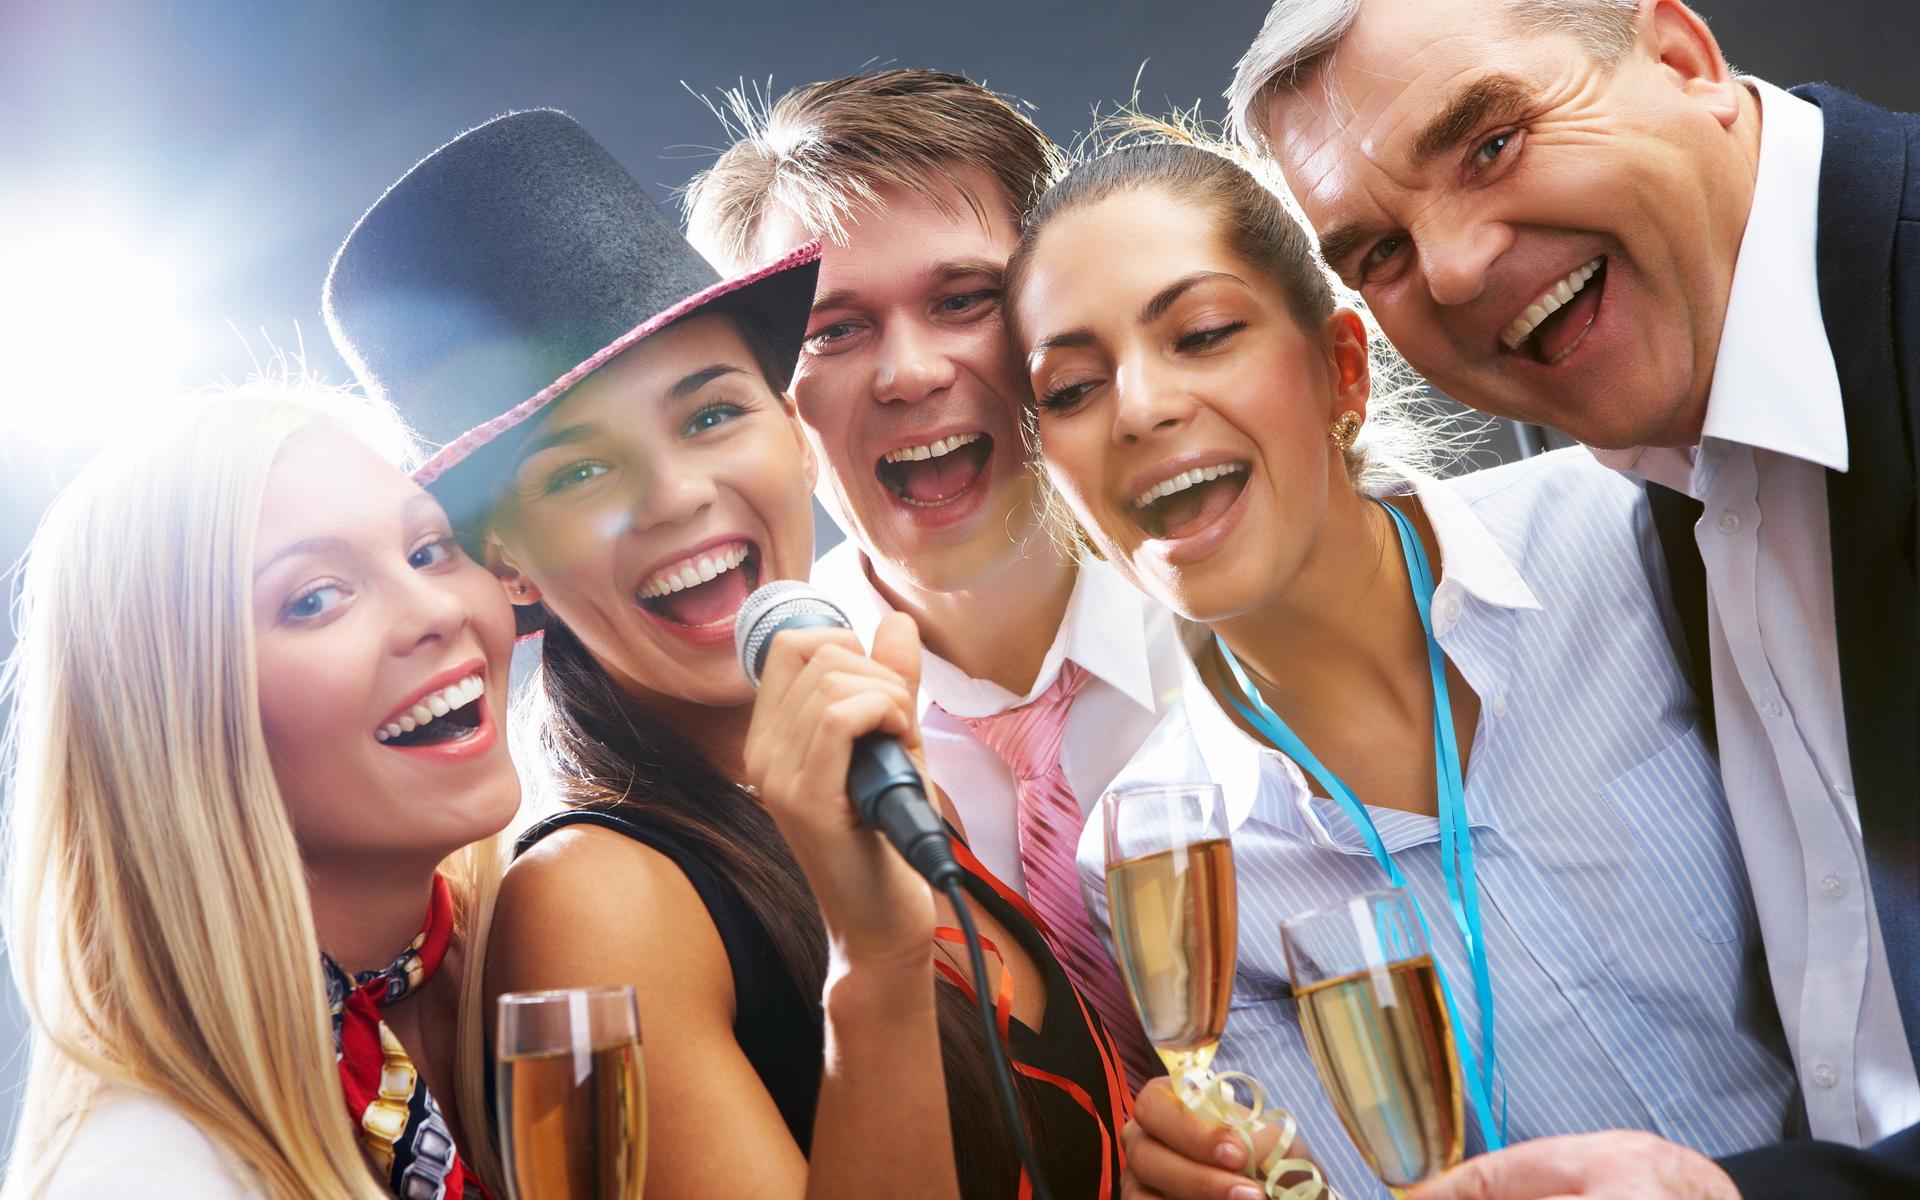 Вечеринка для мужчин картинки